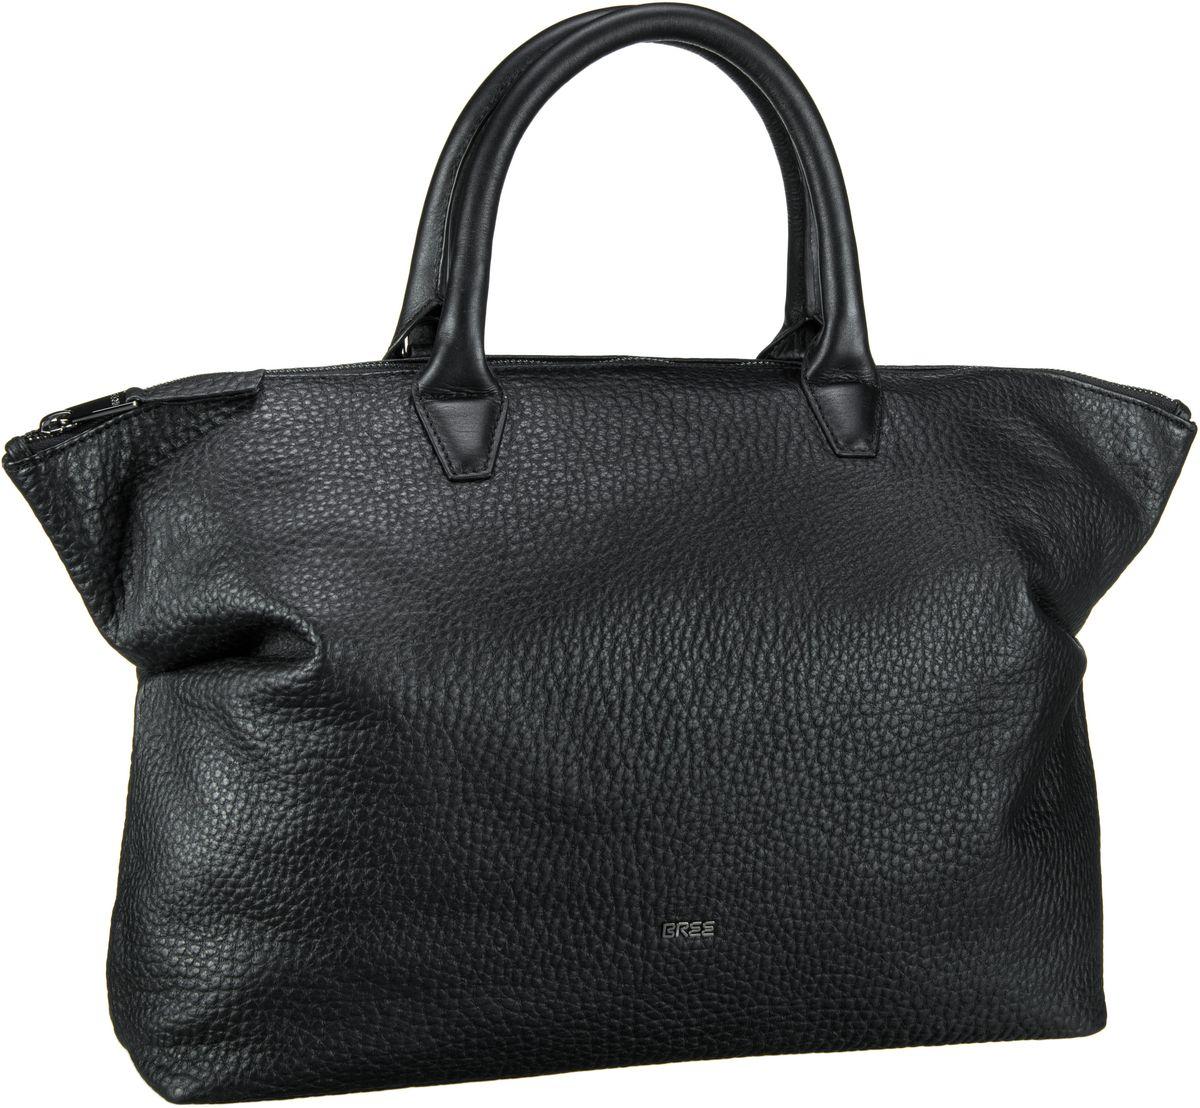 Handtasche Icon Bag Black